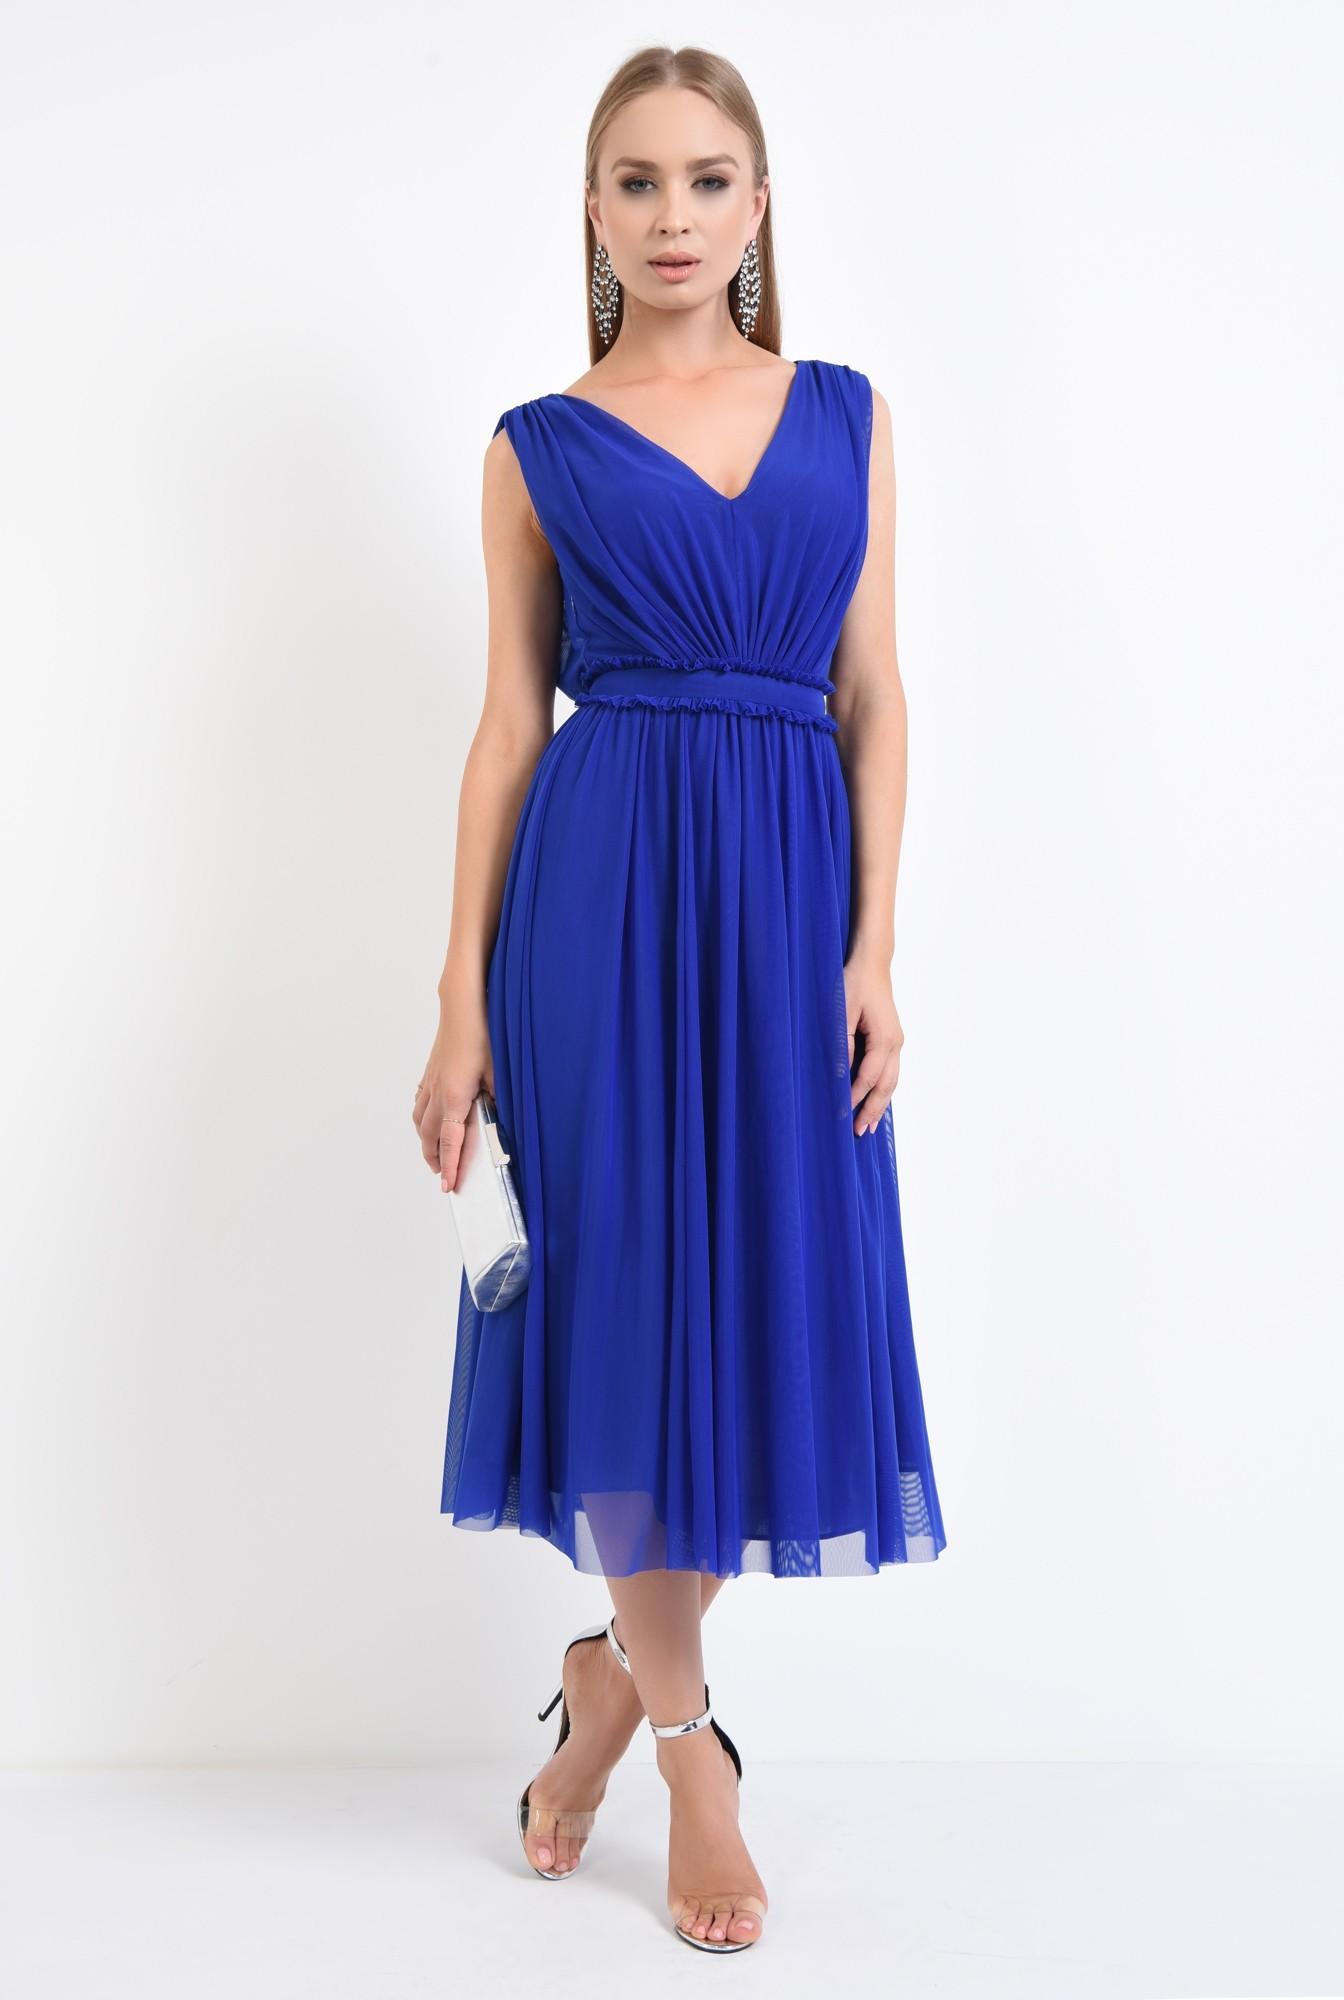 3 - 360 - rochie de seara, tul, albastru, clos, midi, rochii online